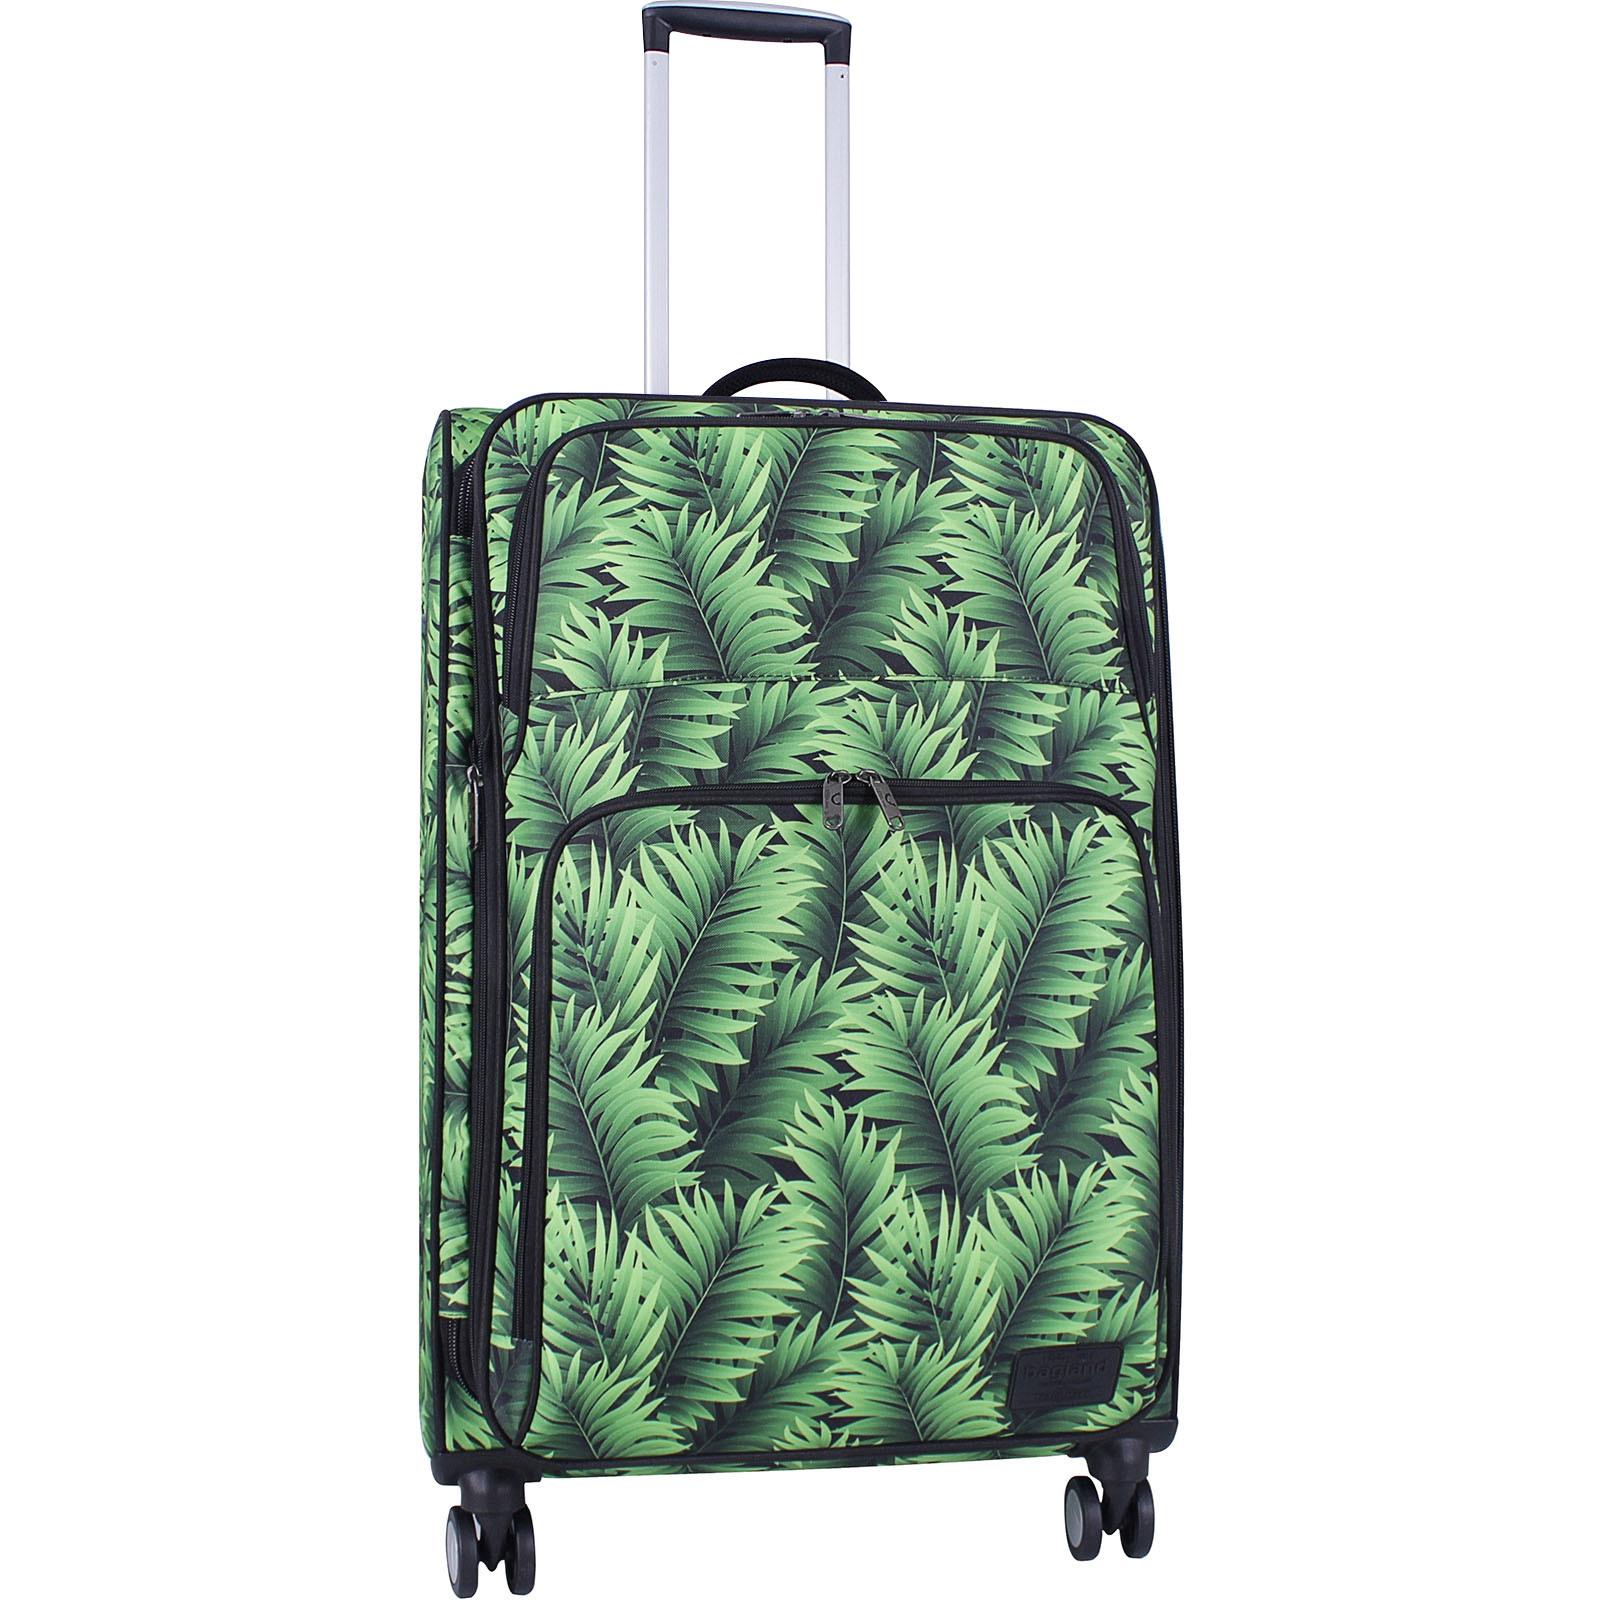 Дорожные чемоданы Чемодан Bagland Валенсия большой дизайн 83 л. сублімація 652 (0037966274) IMG_4972_суб.652_.JPG